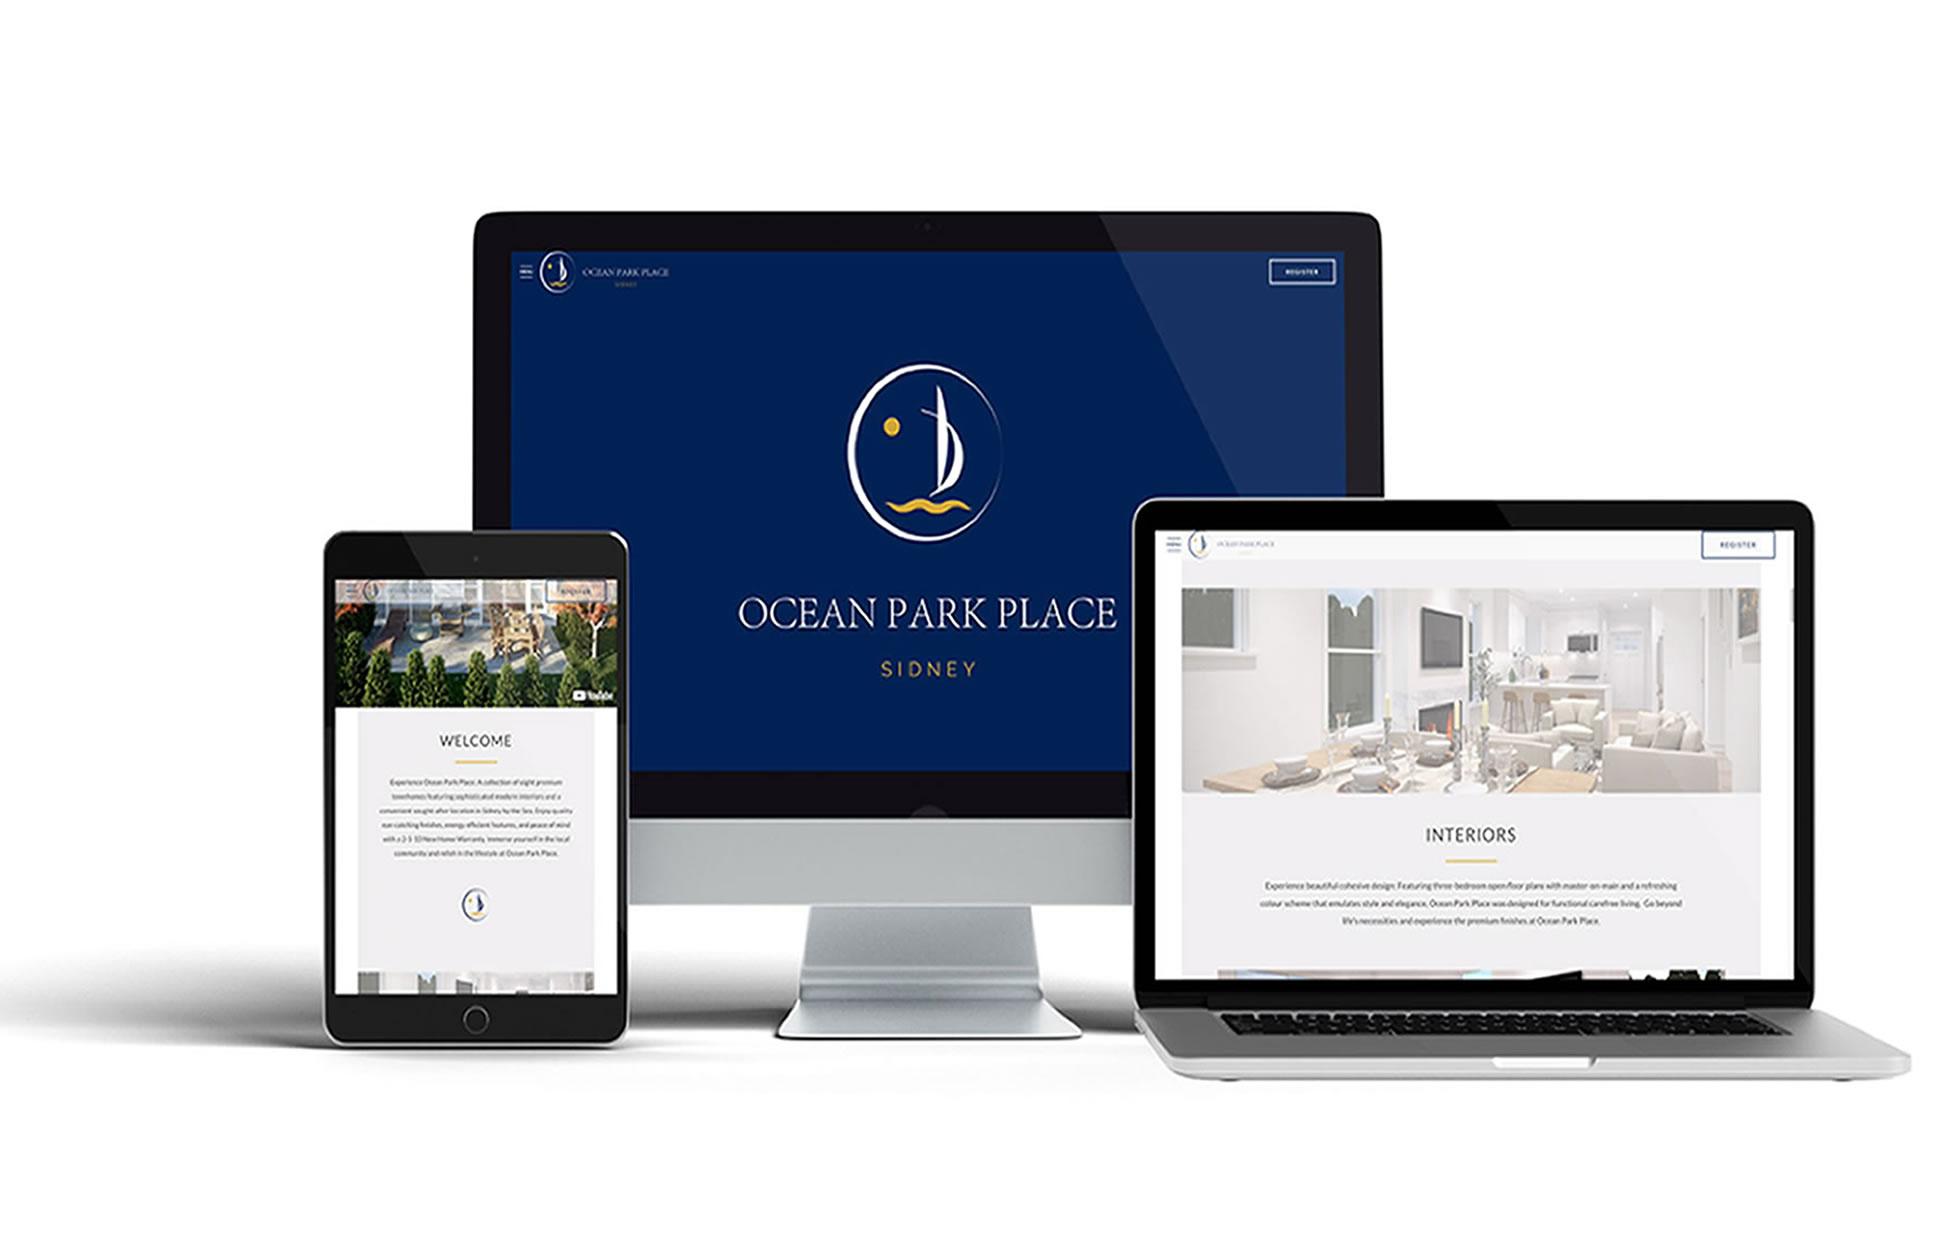 The Ocean Park Place Webpage